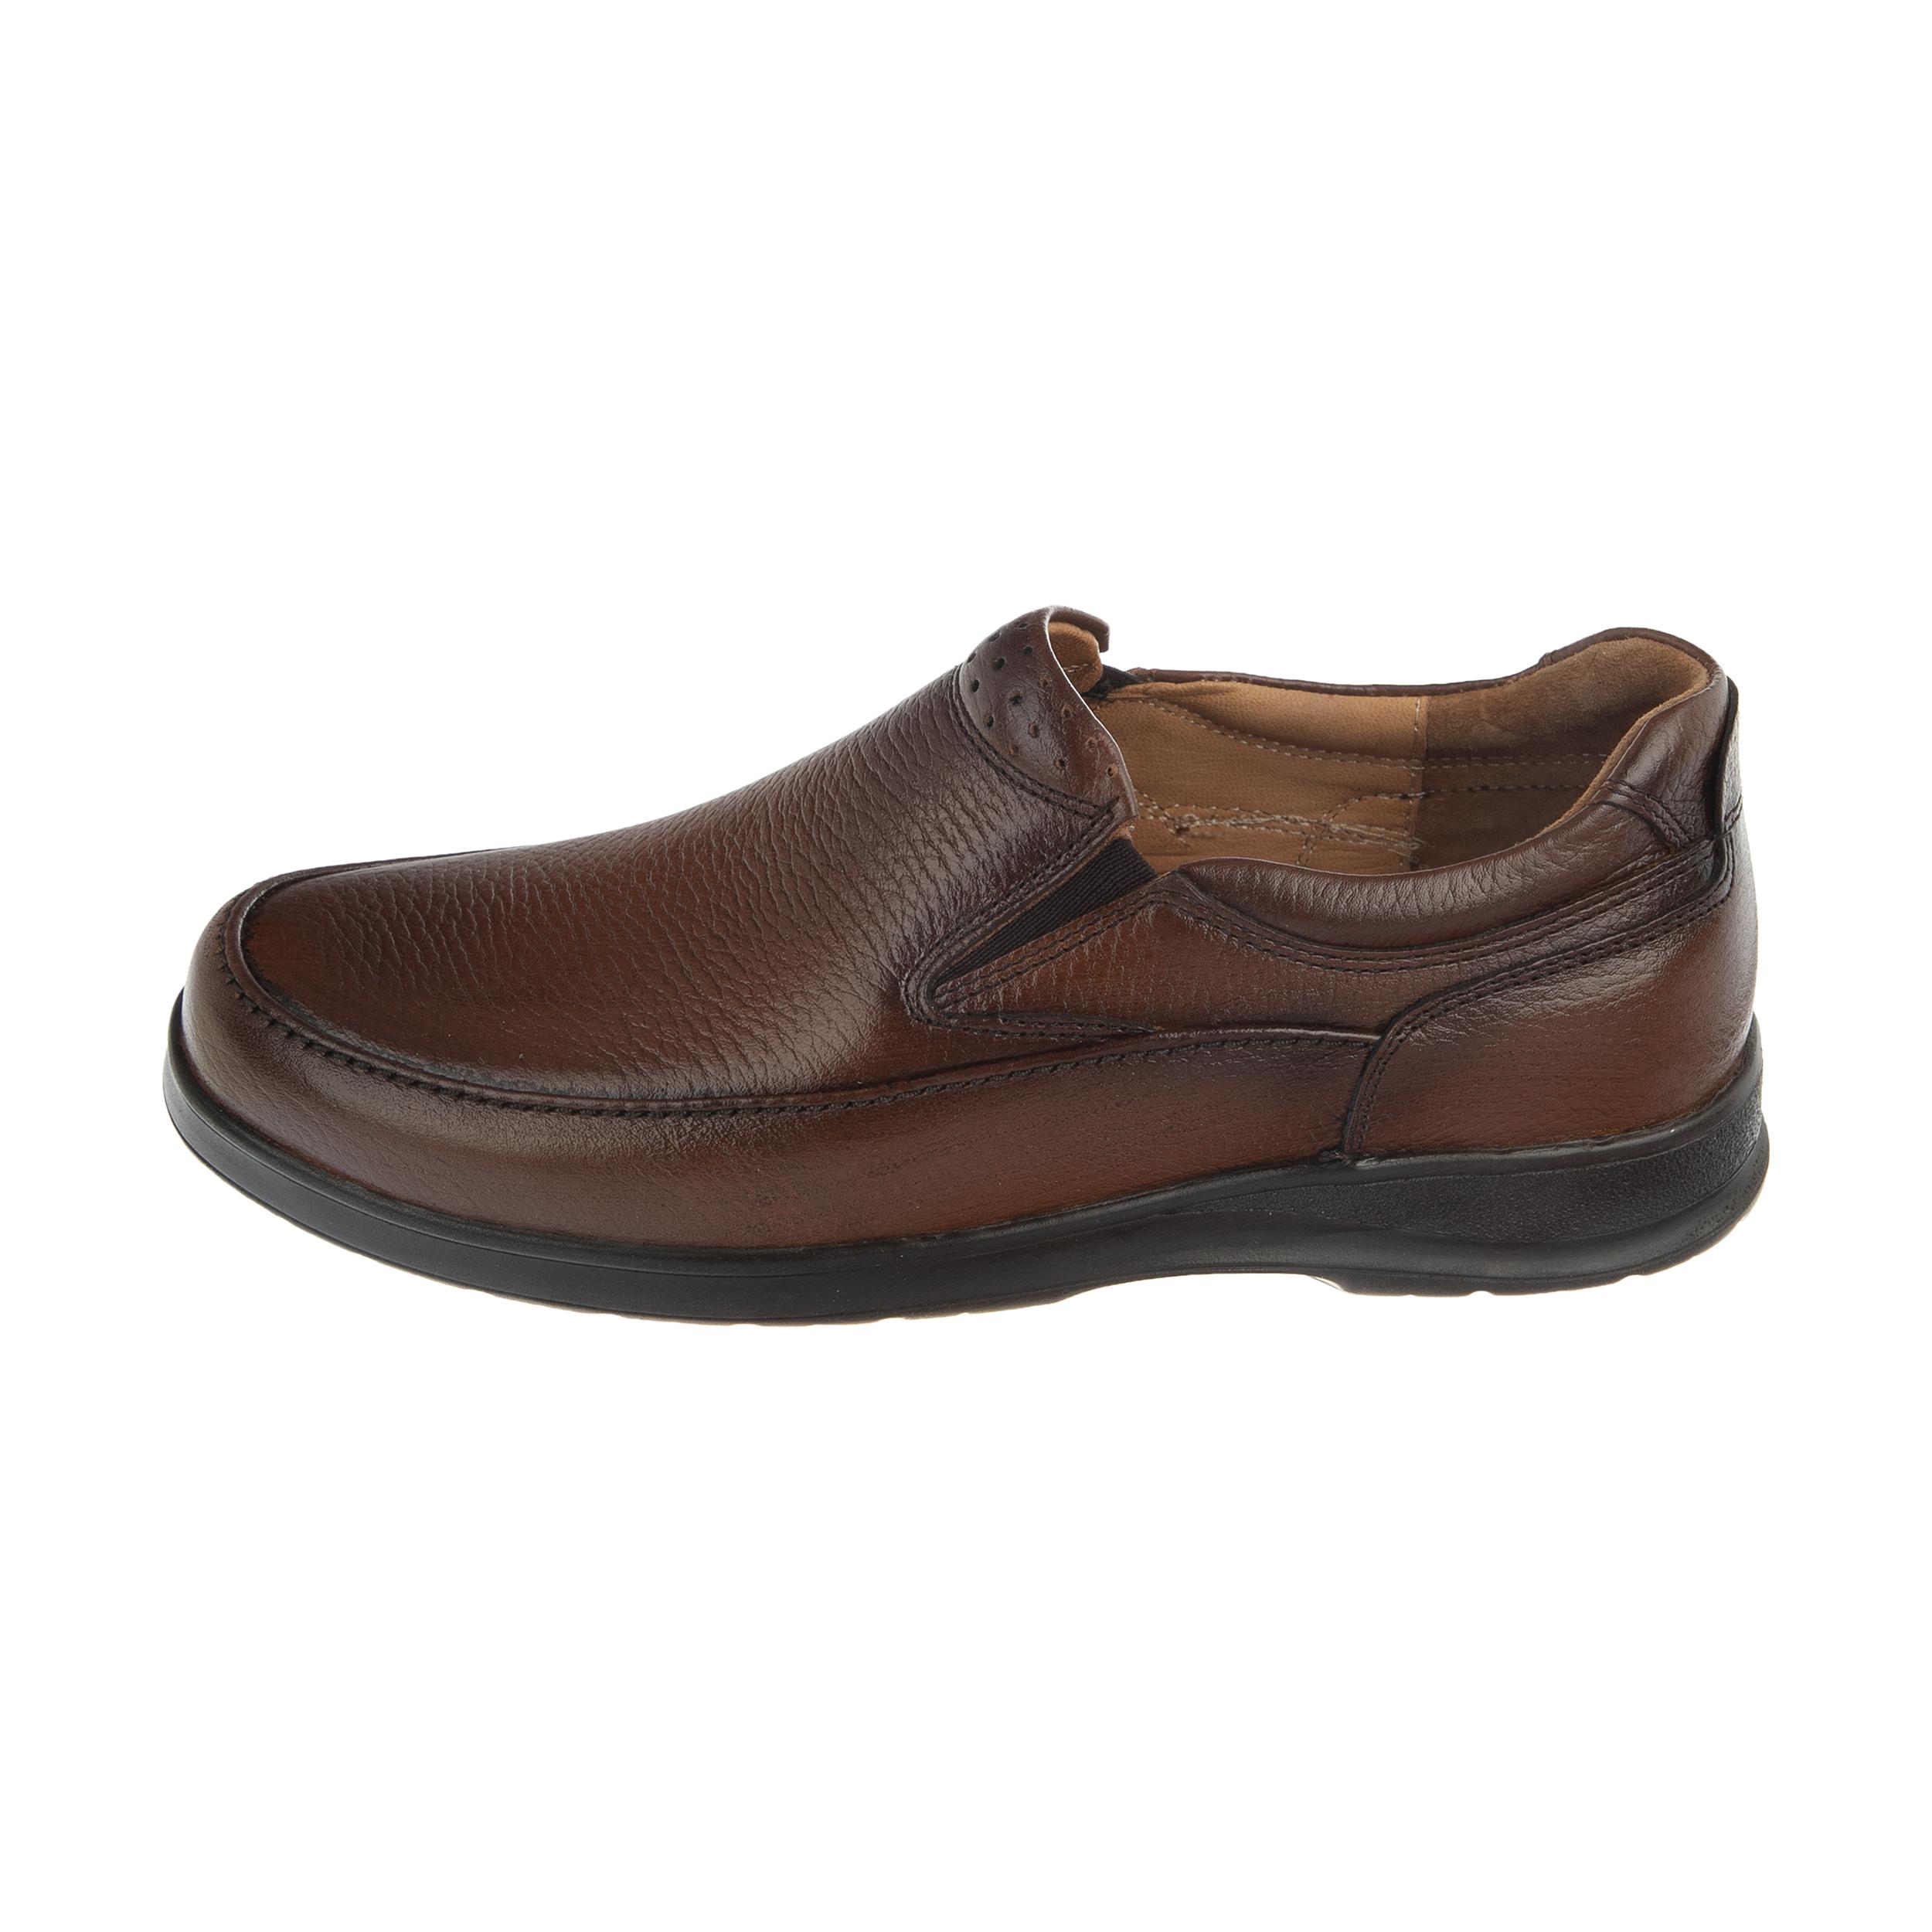 کفش روزمره مردانه مایان مدل 7301A503136